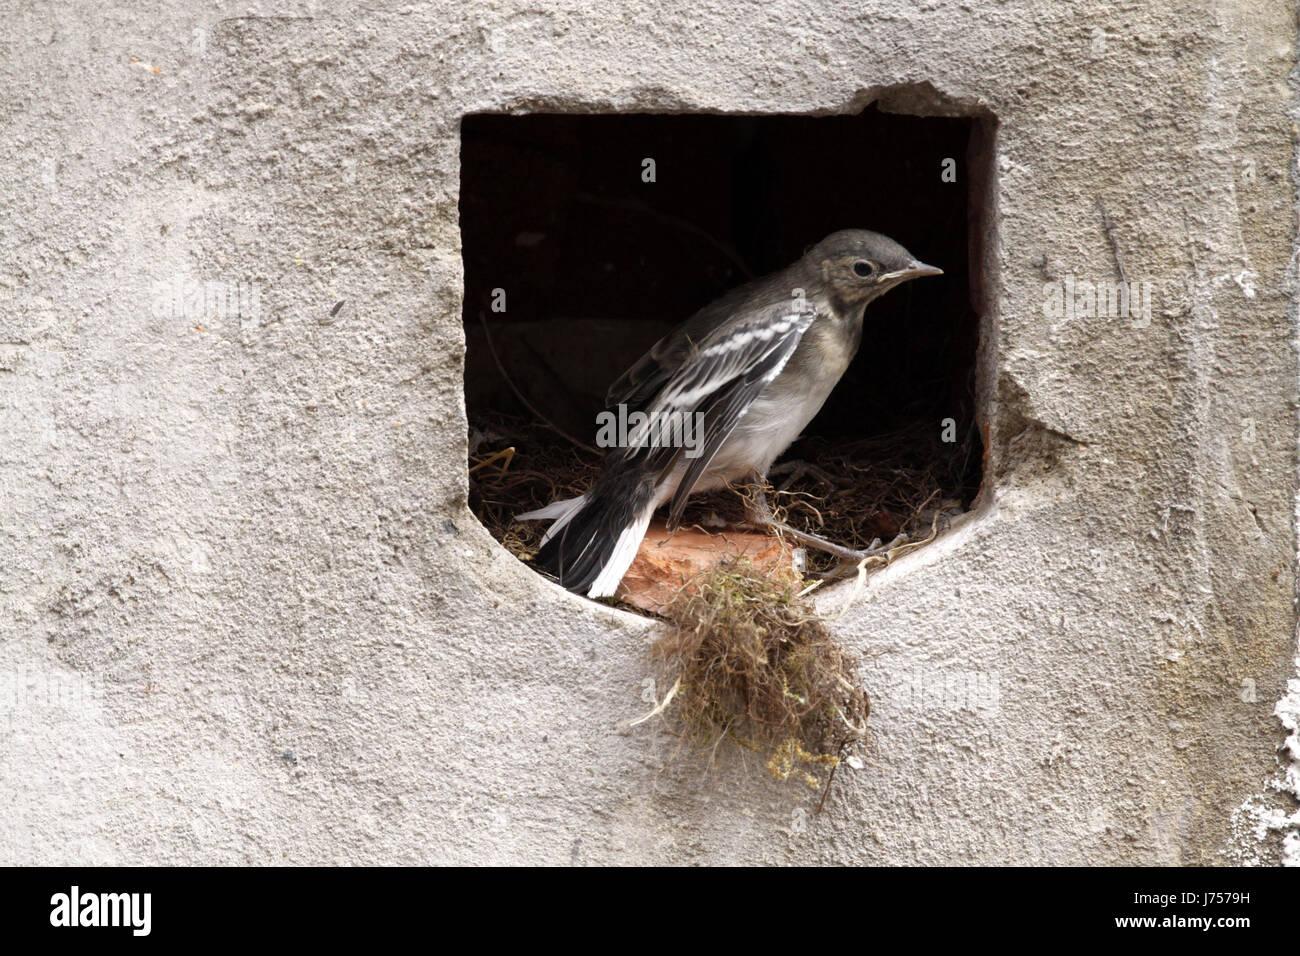 Bird nido di uccelli cantare-bird bobolinks wagtail stilt bird nido di uccelli giovani Foto Stock